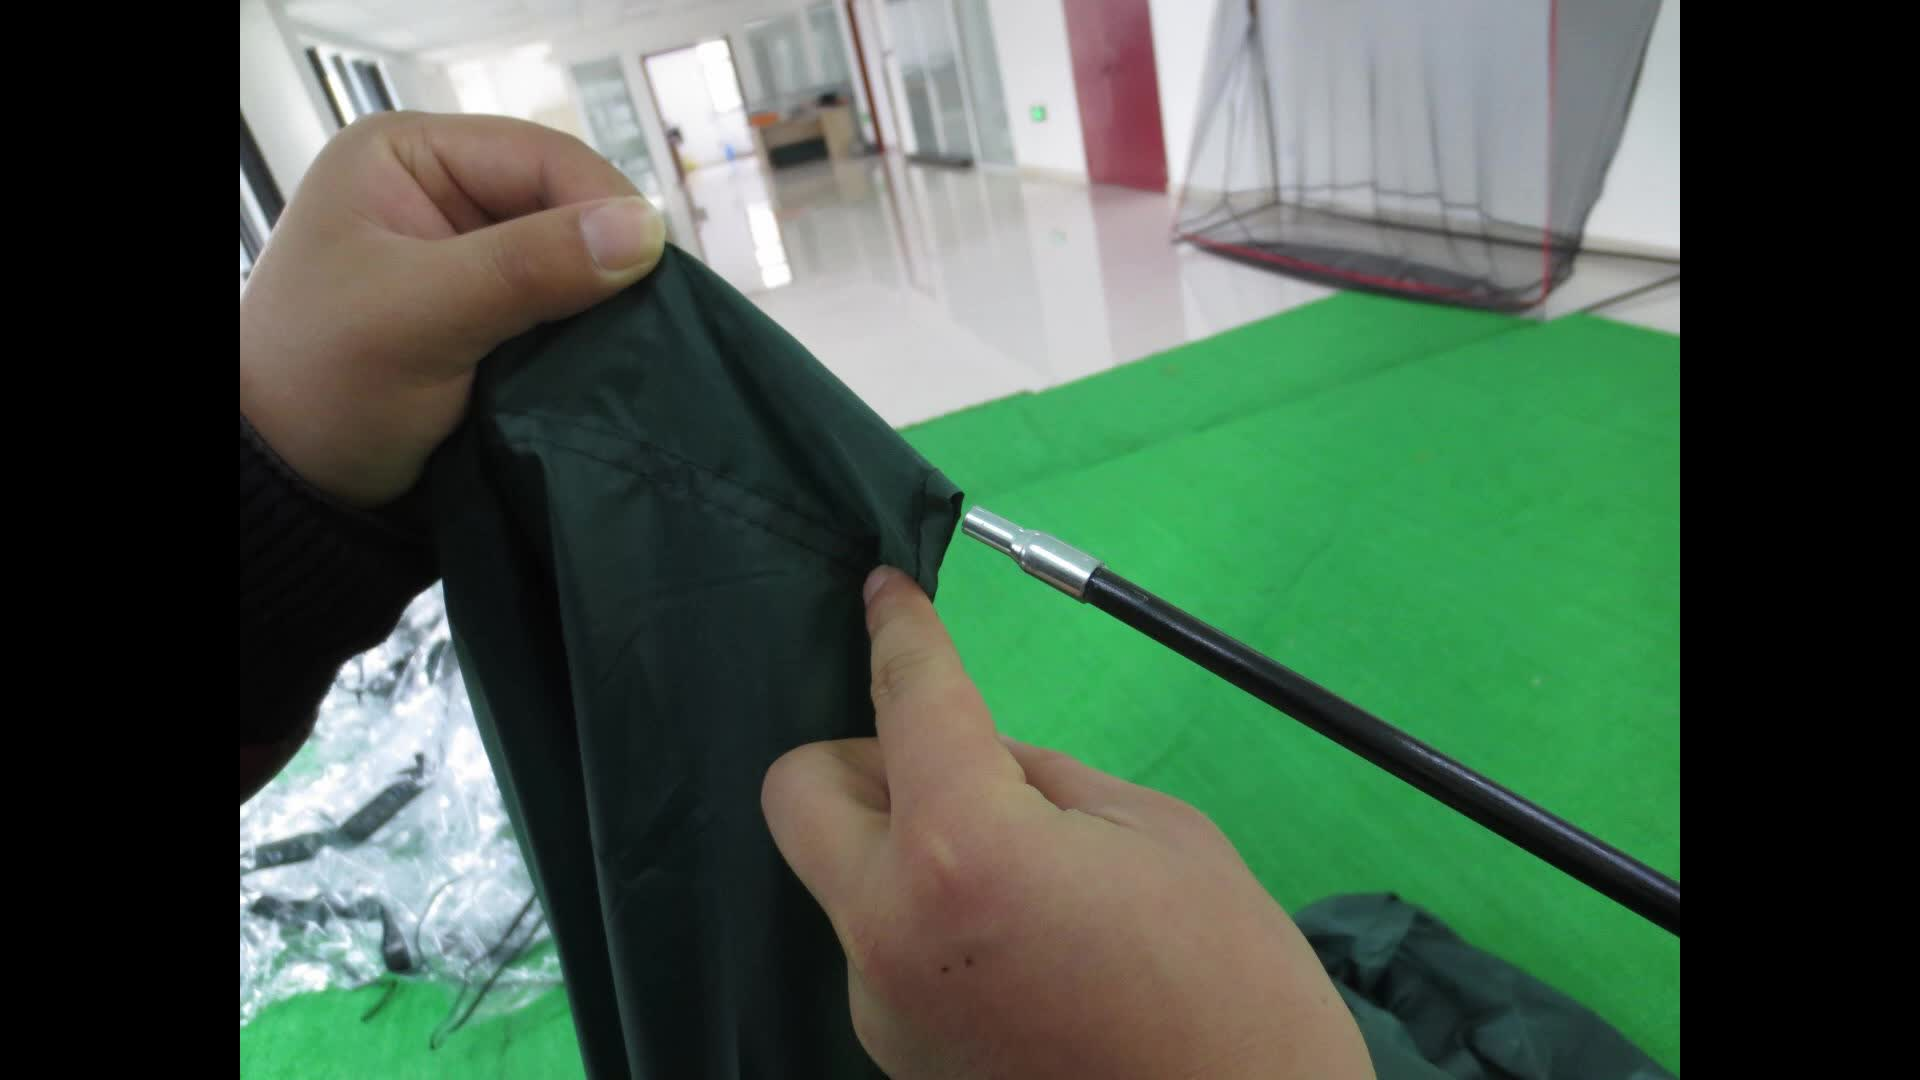 Heavy Duty, Ruimtebesparend Outdoor Opslag Werpen Tent